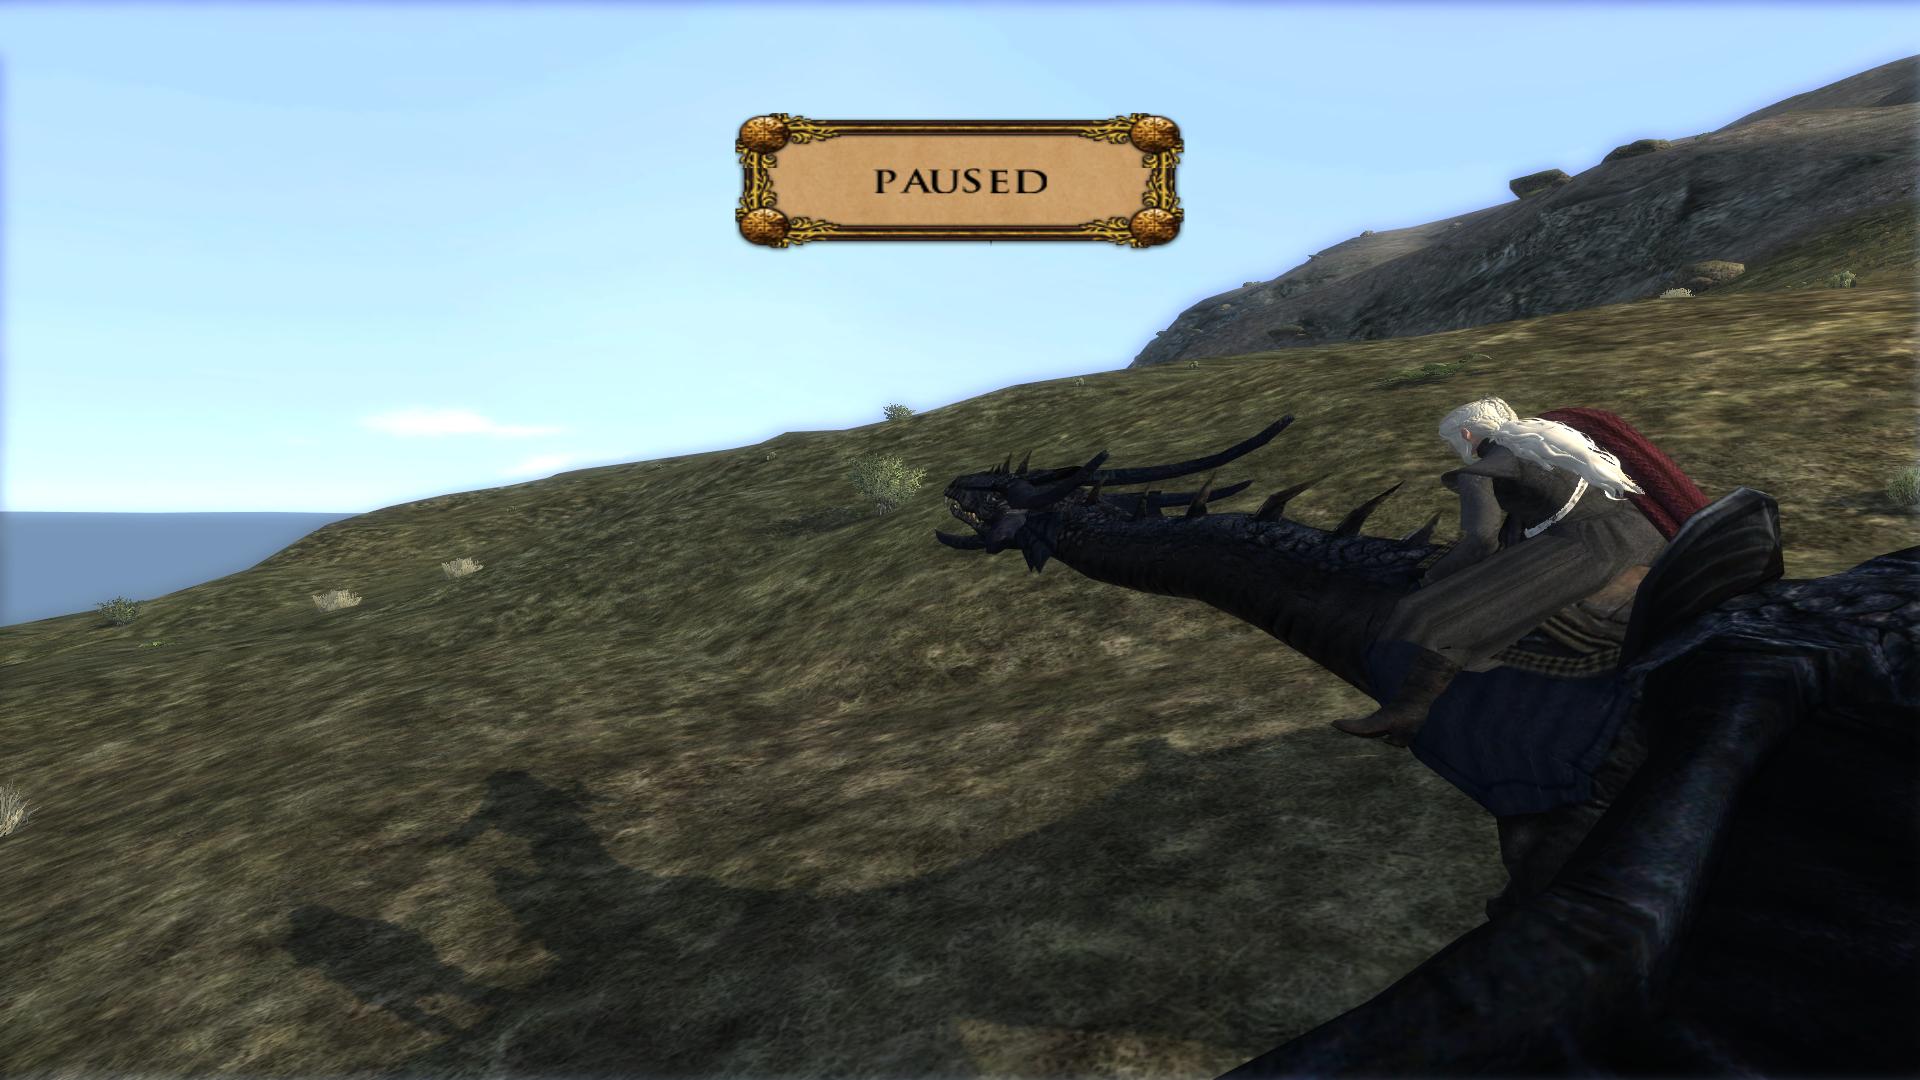 Daenarys Stormborn on a dragon?